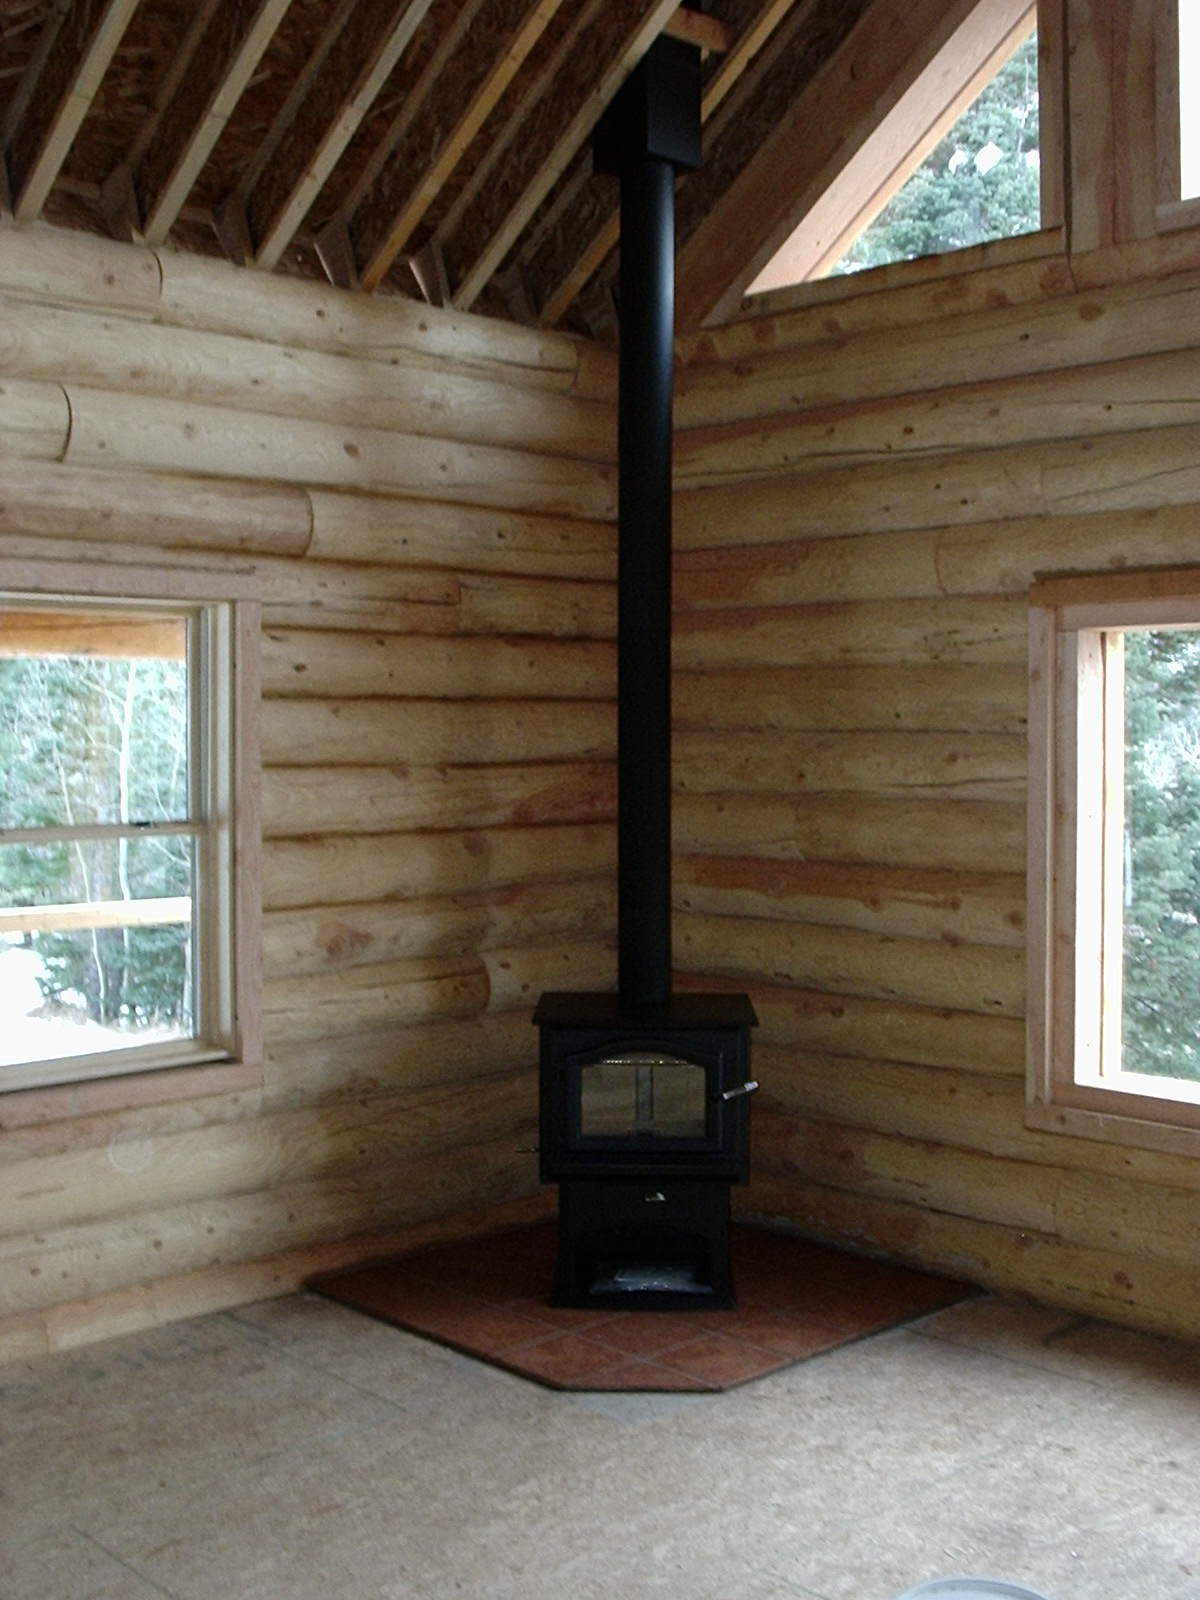 River Run Cabin Cuchara Colorado Christmas Trip Wood